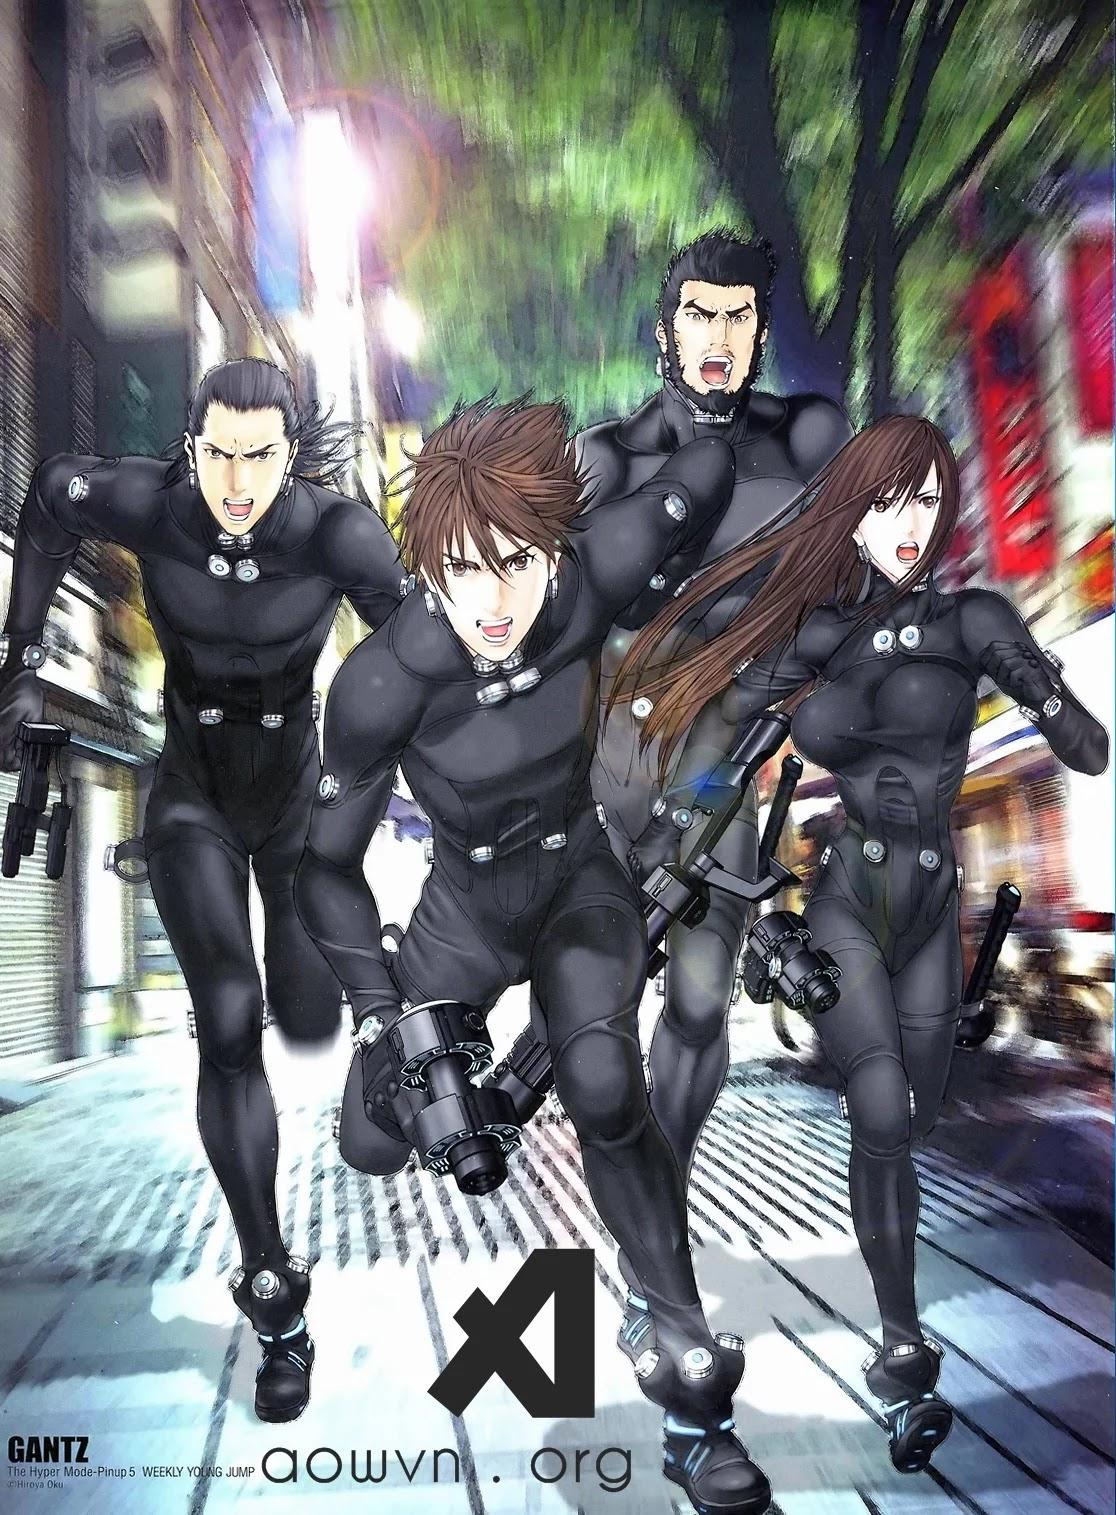 gantz aowvn - [ Đã Kết Full ] Gantz | Manga Online - hấp dẫn